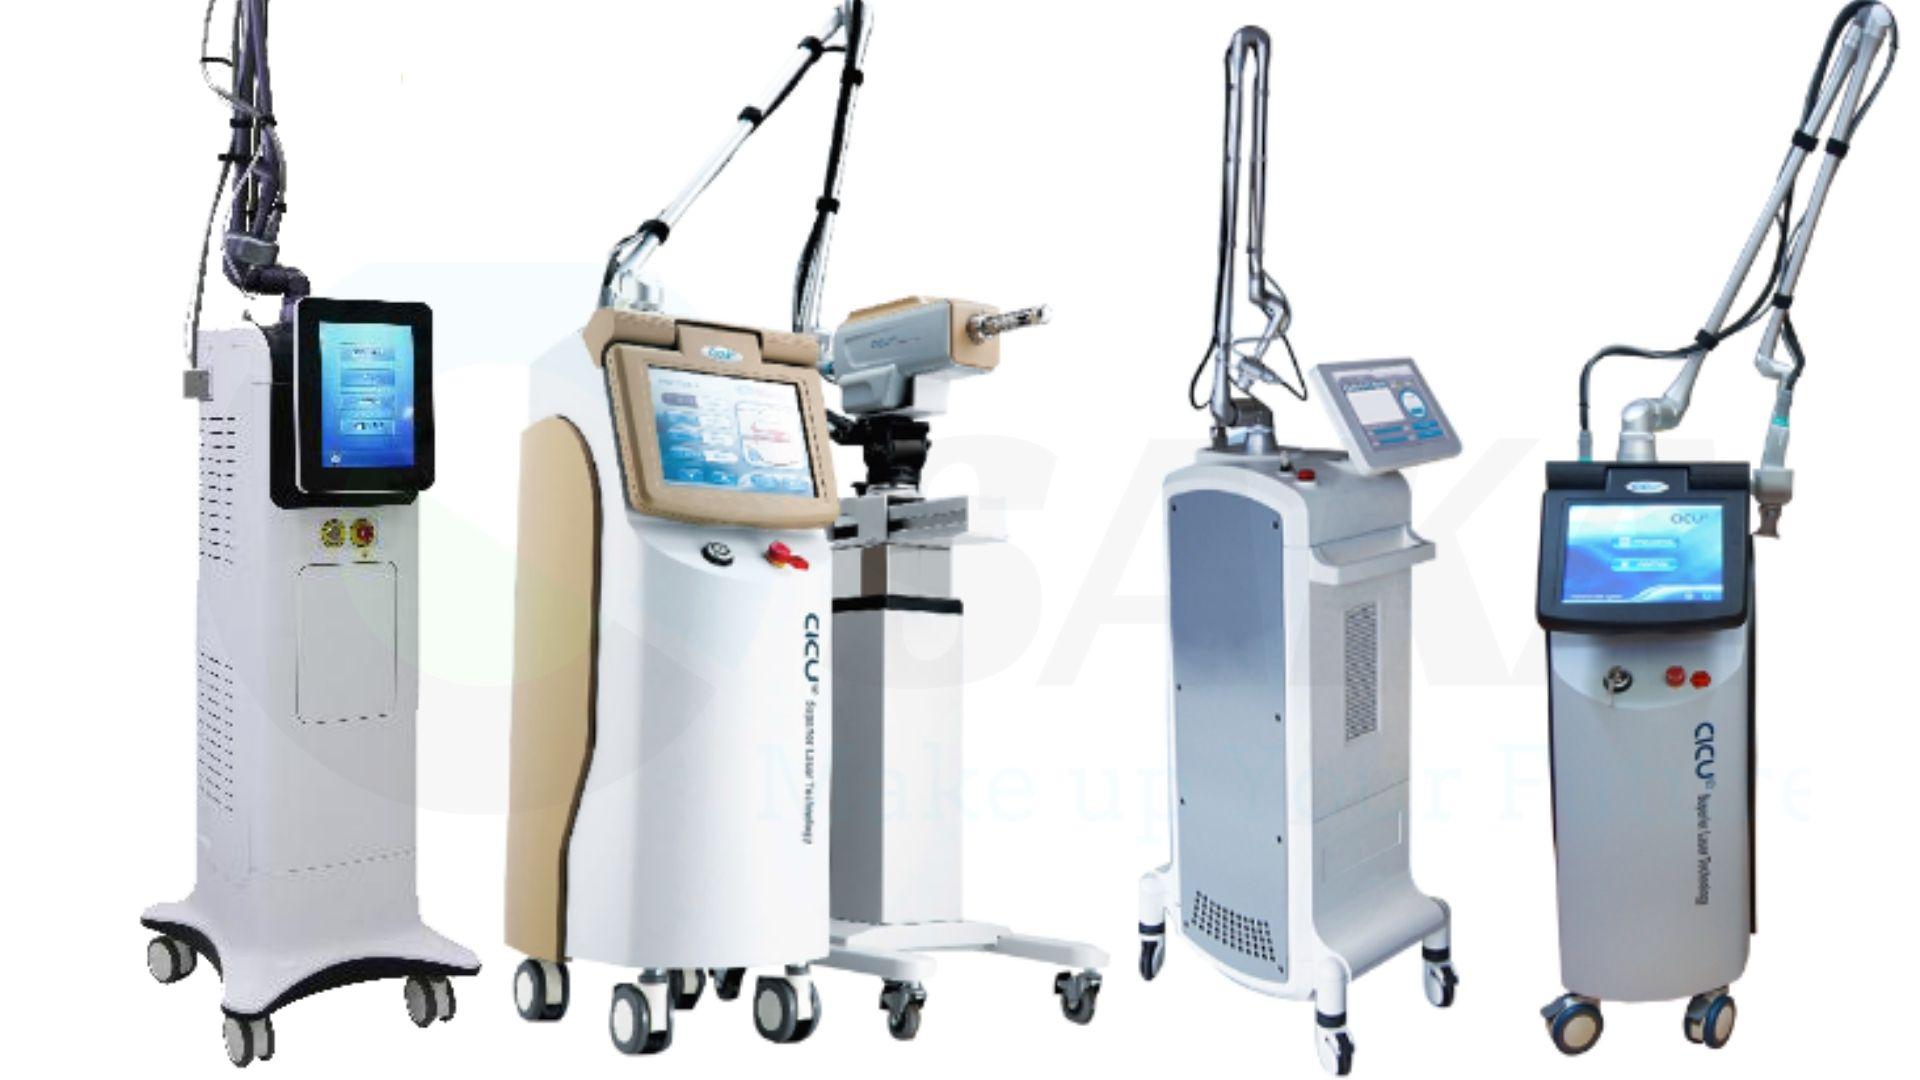 Giới thiệu máy trị sẹo Laser Co2 Fractional